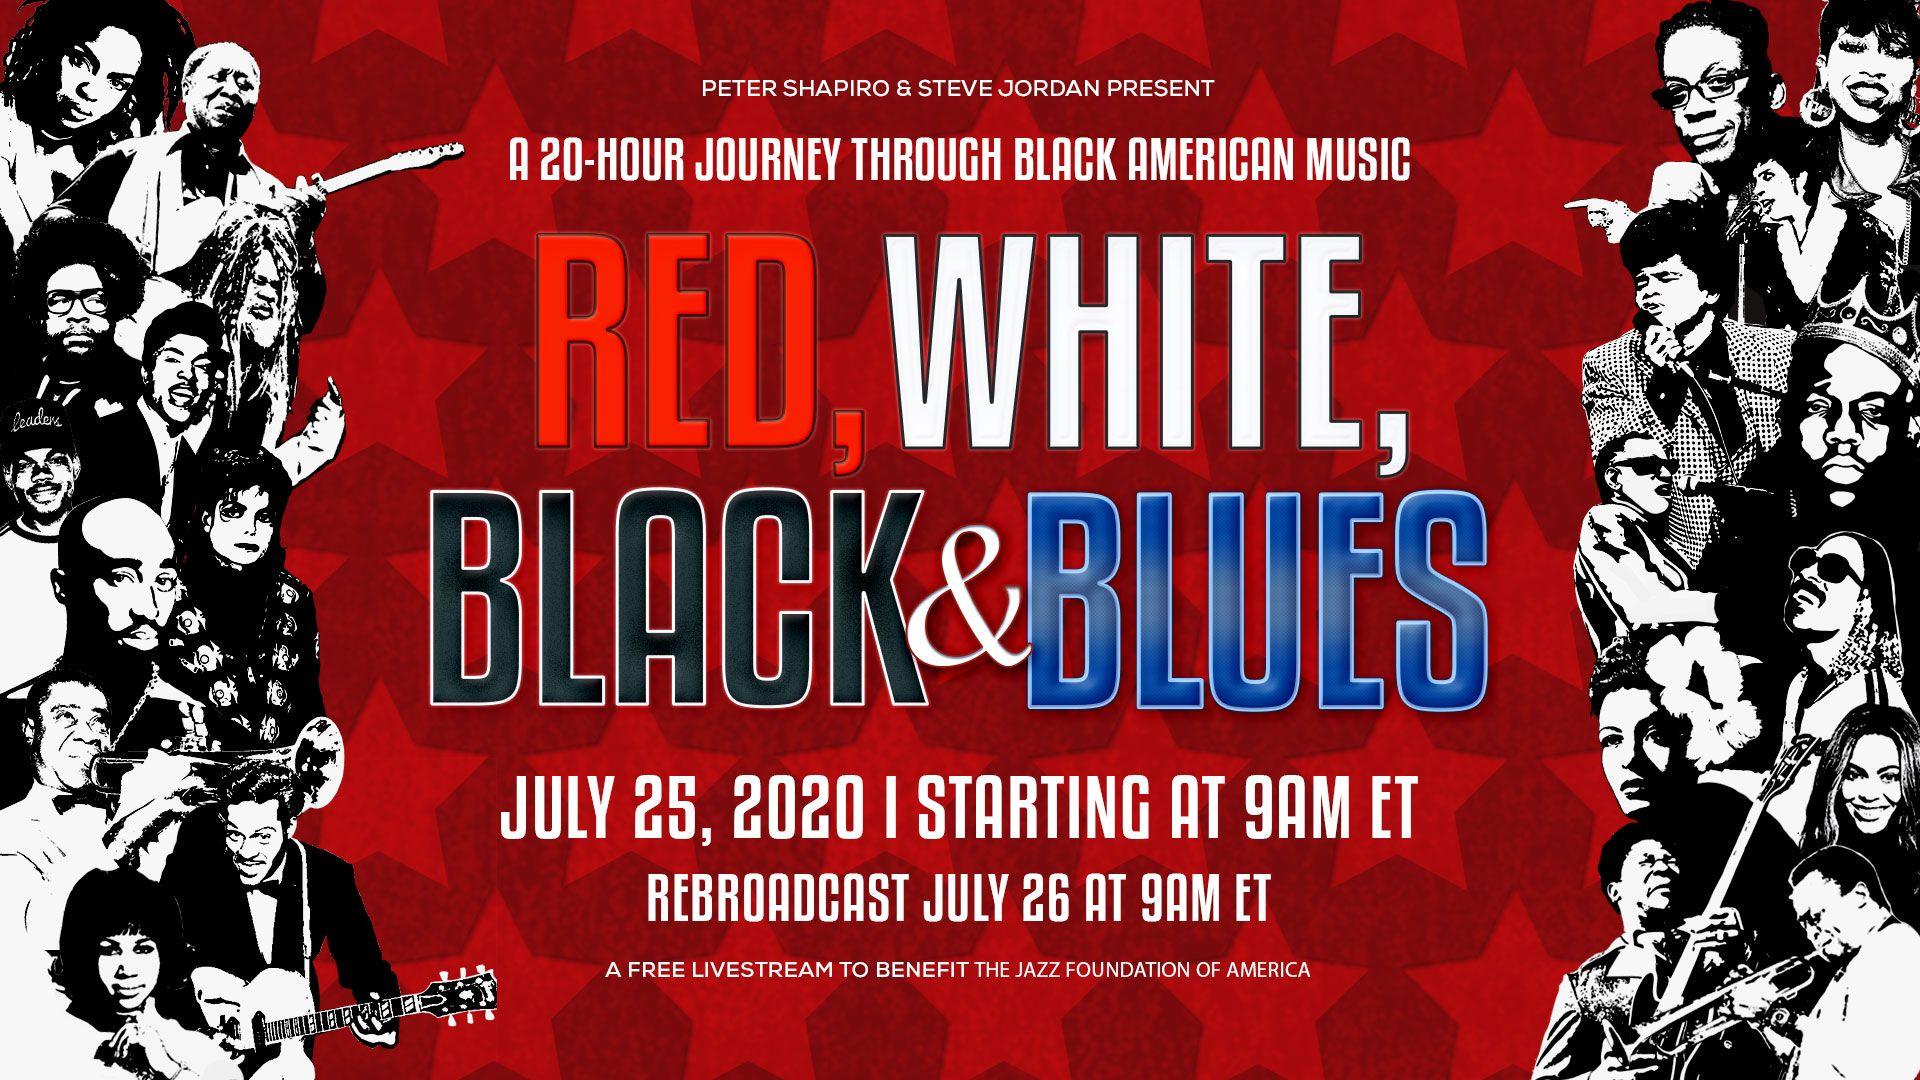 20200725_red,WhiteBlack&Blues_slide_1920x1080